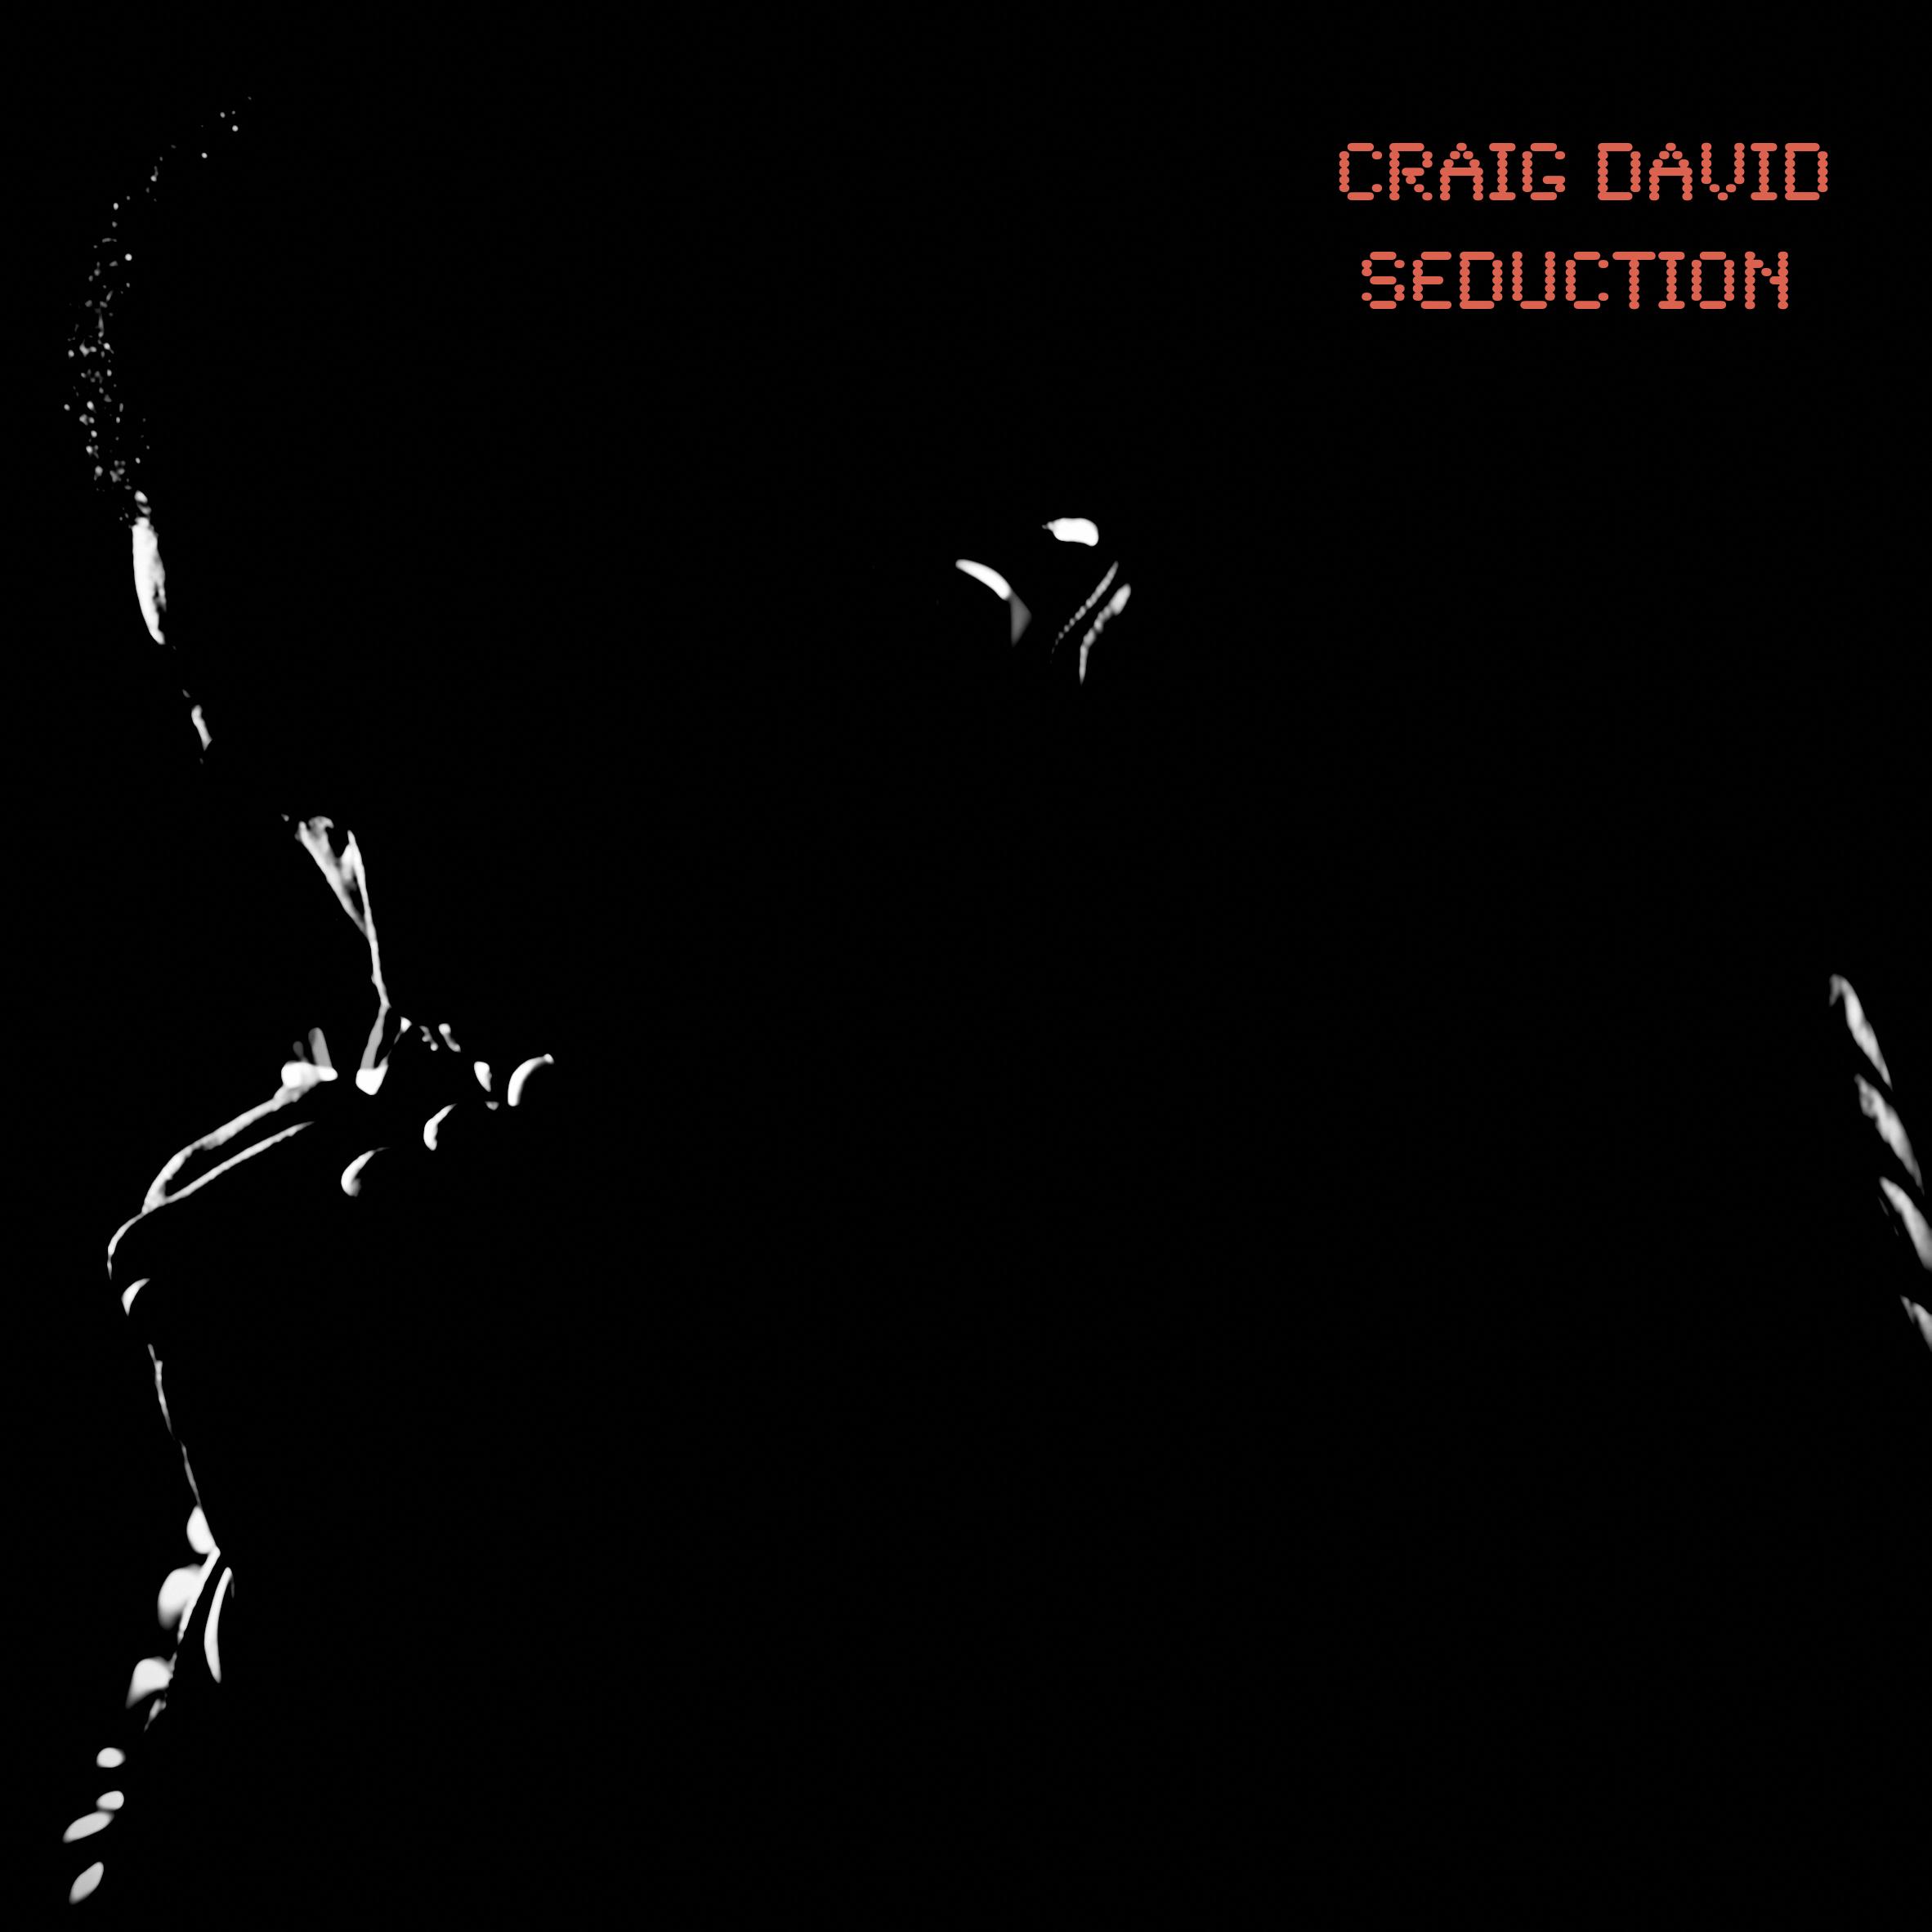 Craig David Seduction